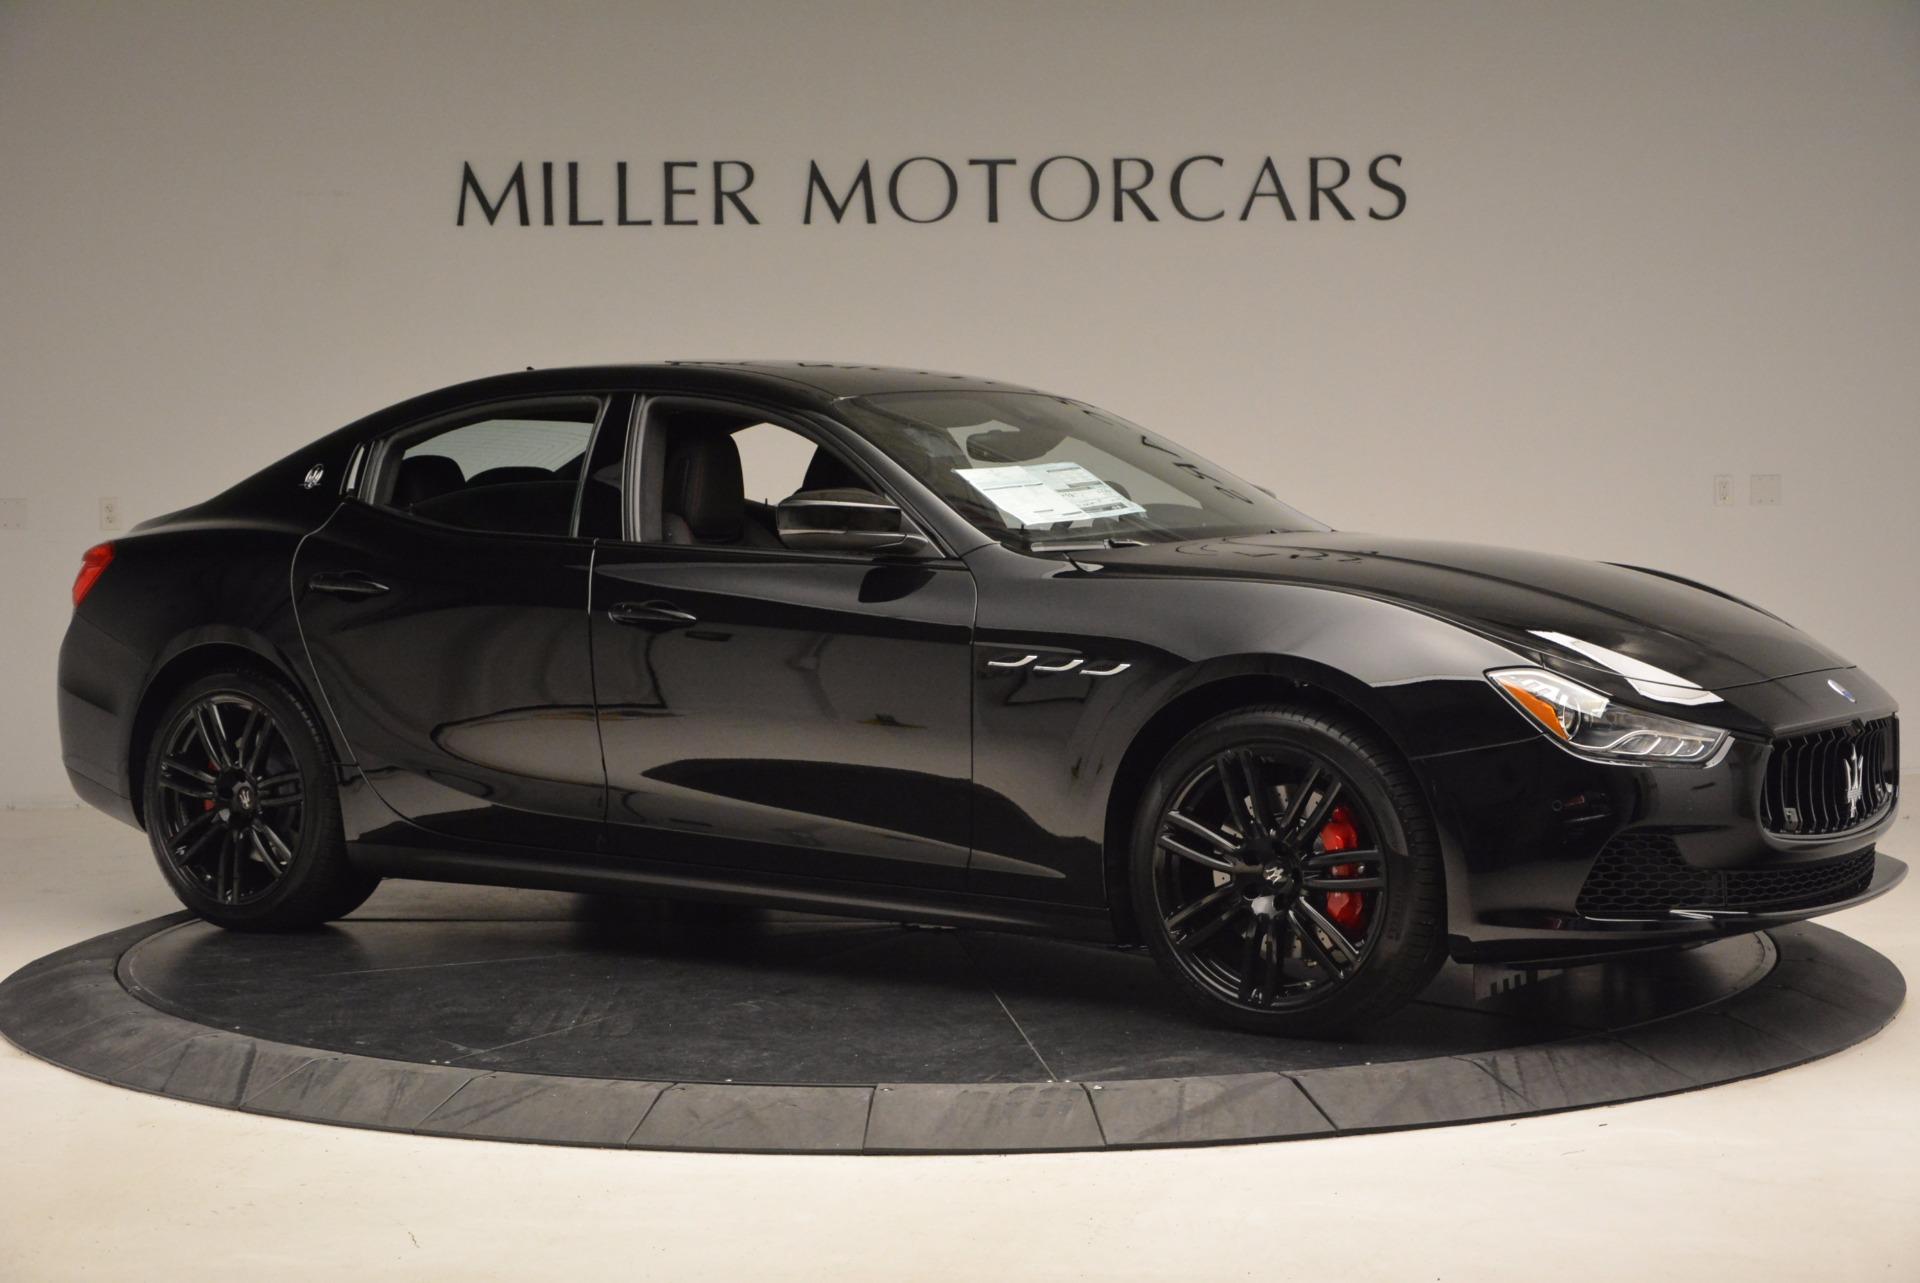 New 2017 Maserati Ghibli SQ4 S Q4 Nerissimo Edition